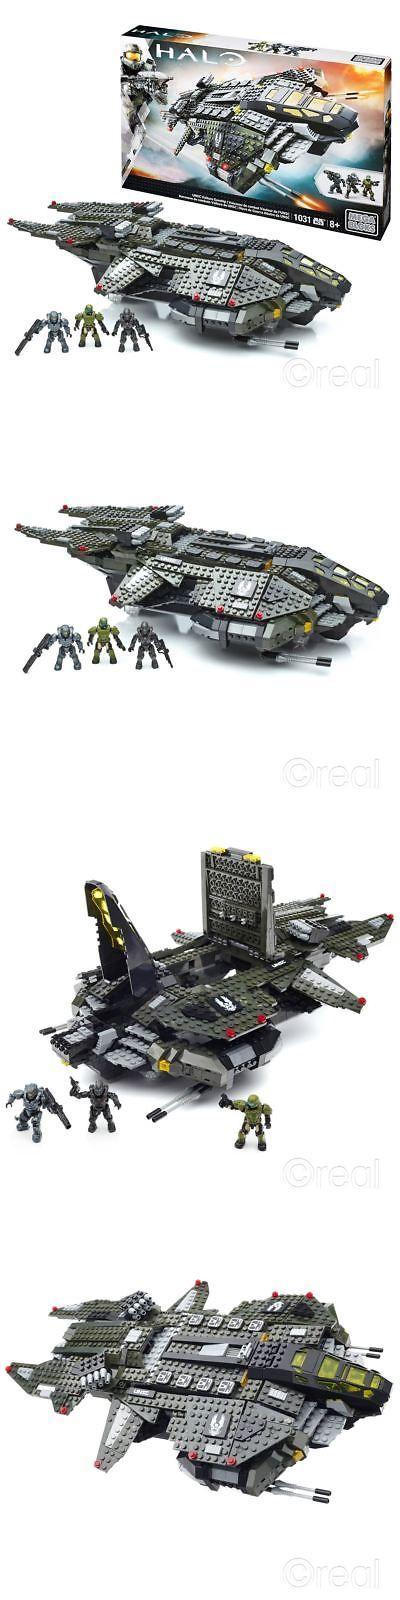 Mega Bloks 52338: New Mega Bloks Halo Unsc Vulture Gunship Building Playset And Figures Official -> BUY IT NOW ONLY: $79.99 on eBay!